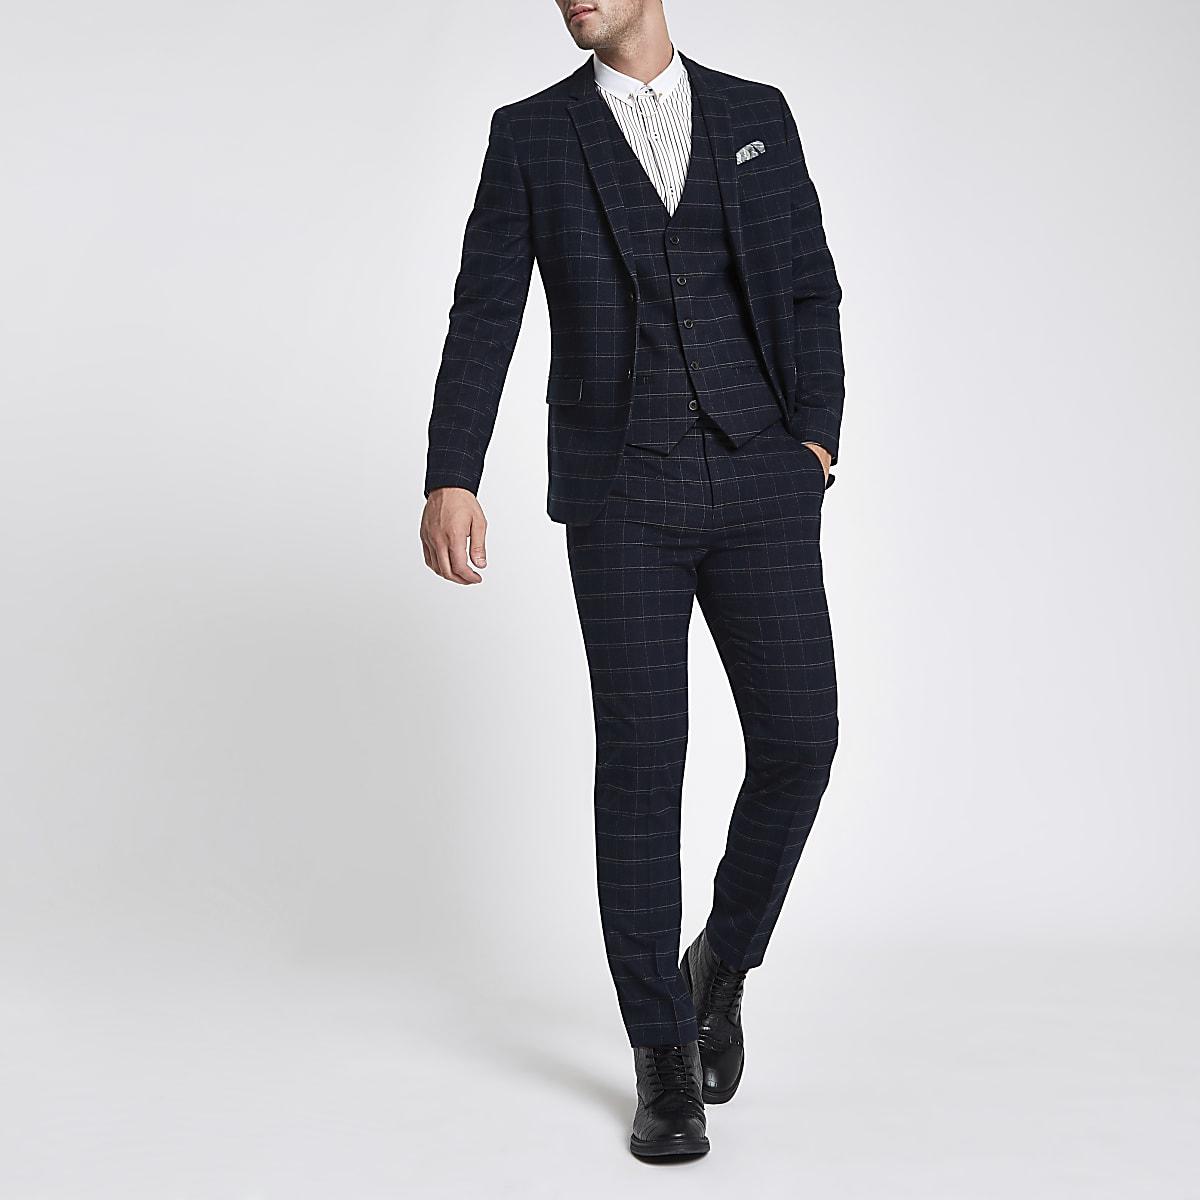 Veste de costume skinny à grands carreaux bleu marine